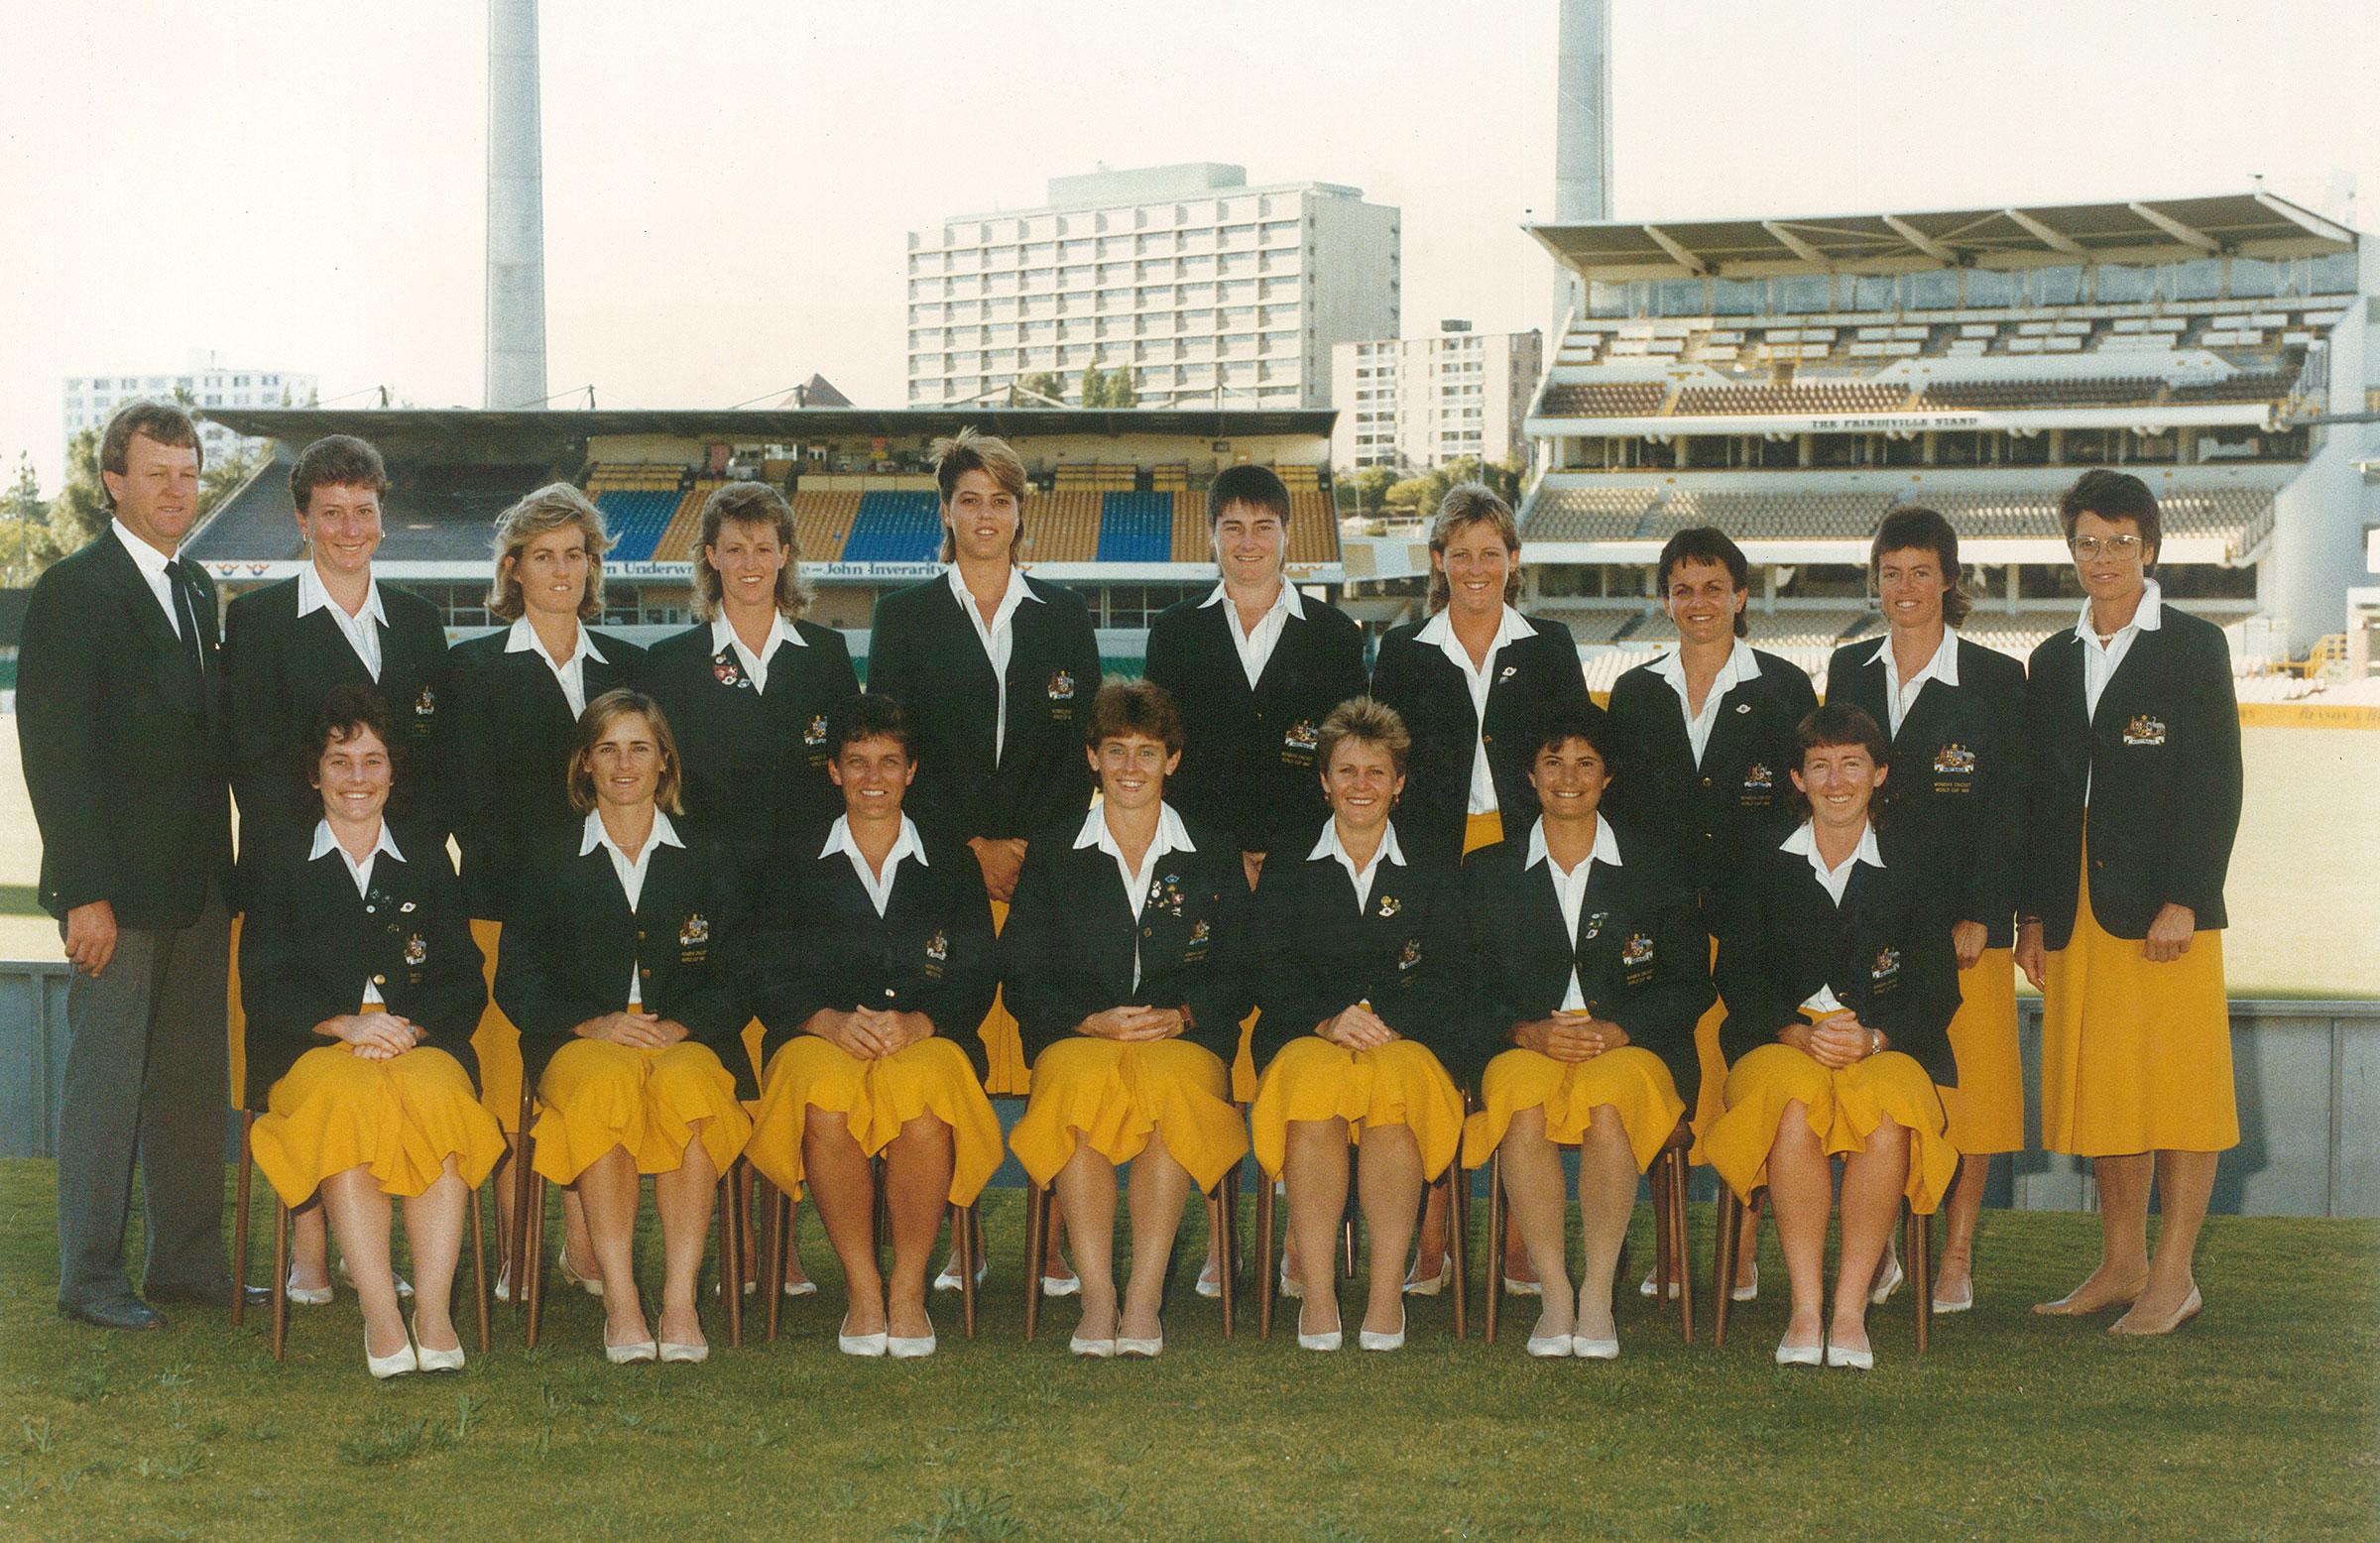 1988 made it a three-peat for Australia